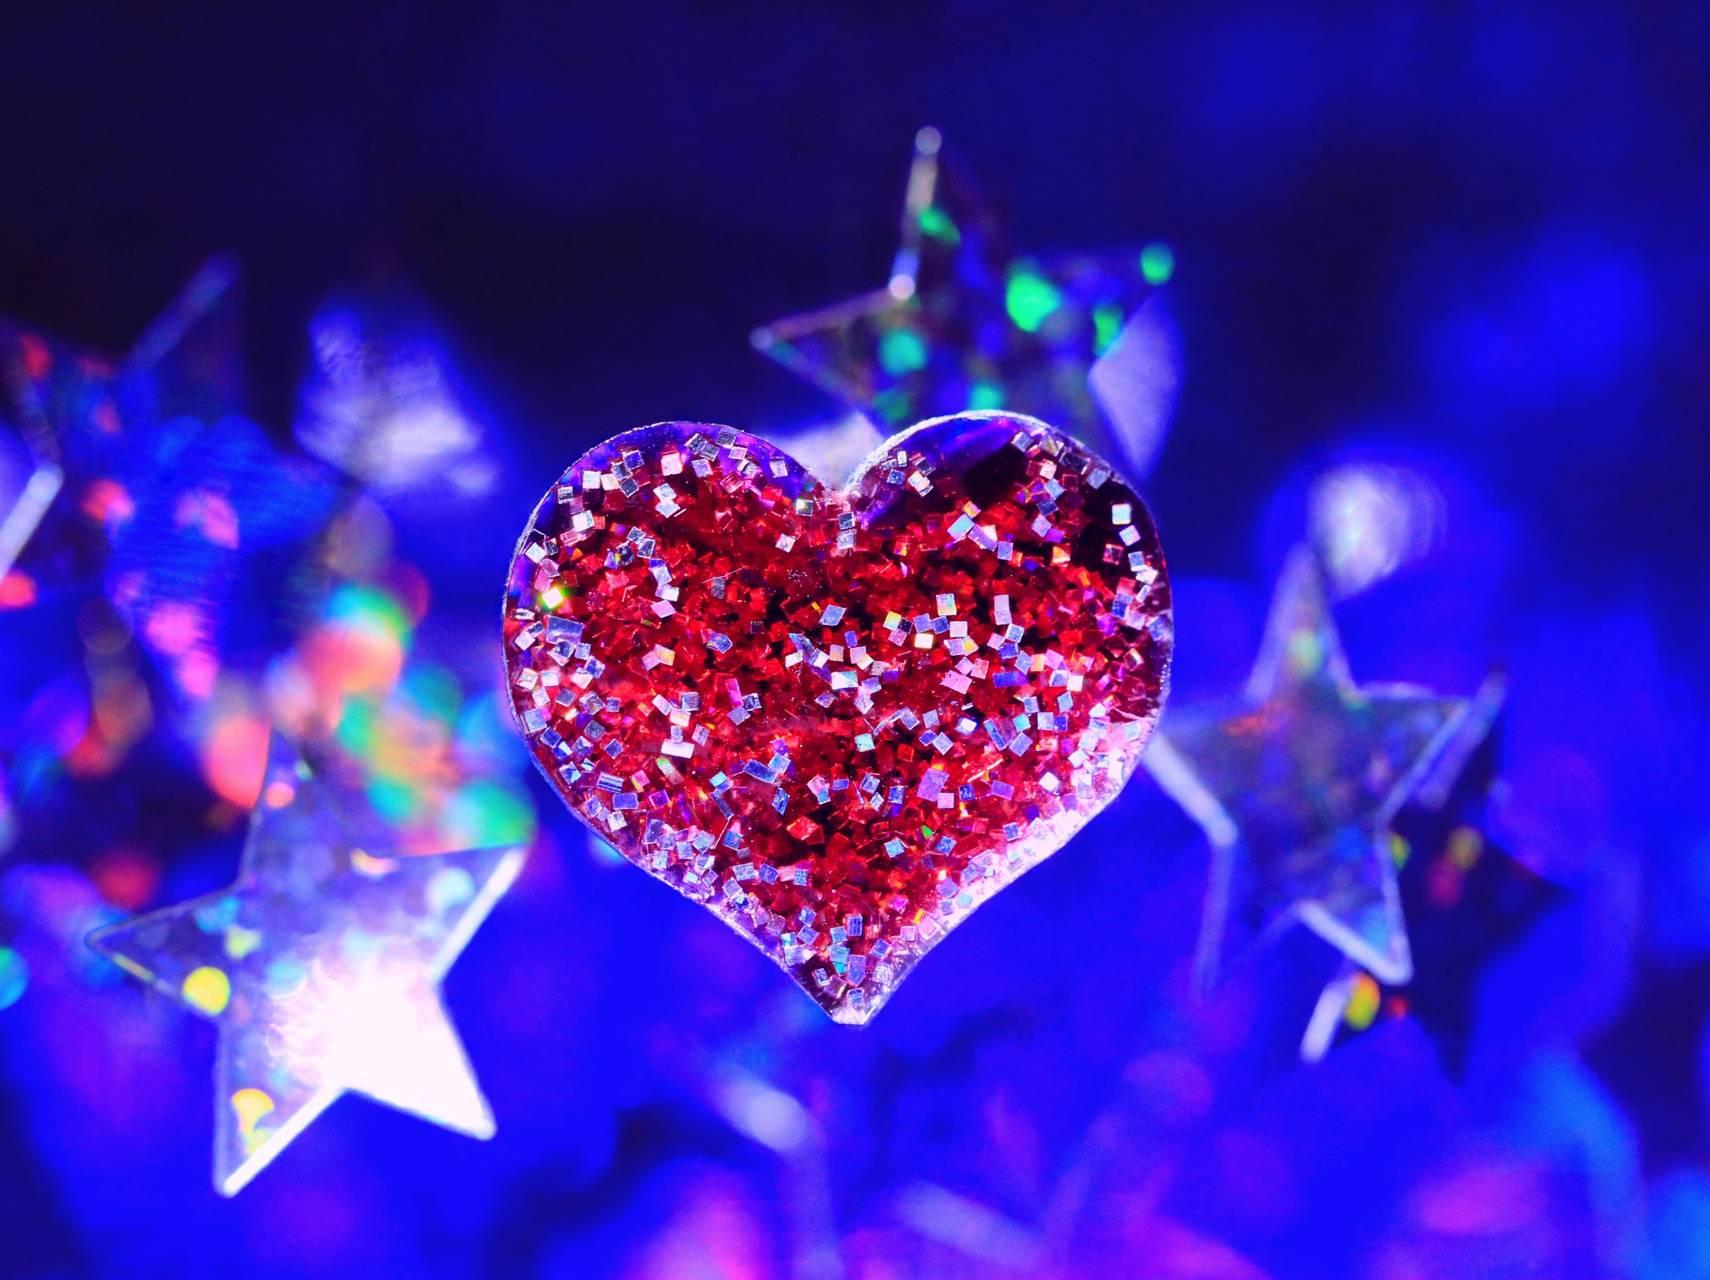 Картинки и блестяшки с сердечками